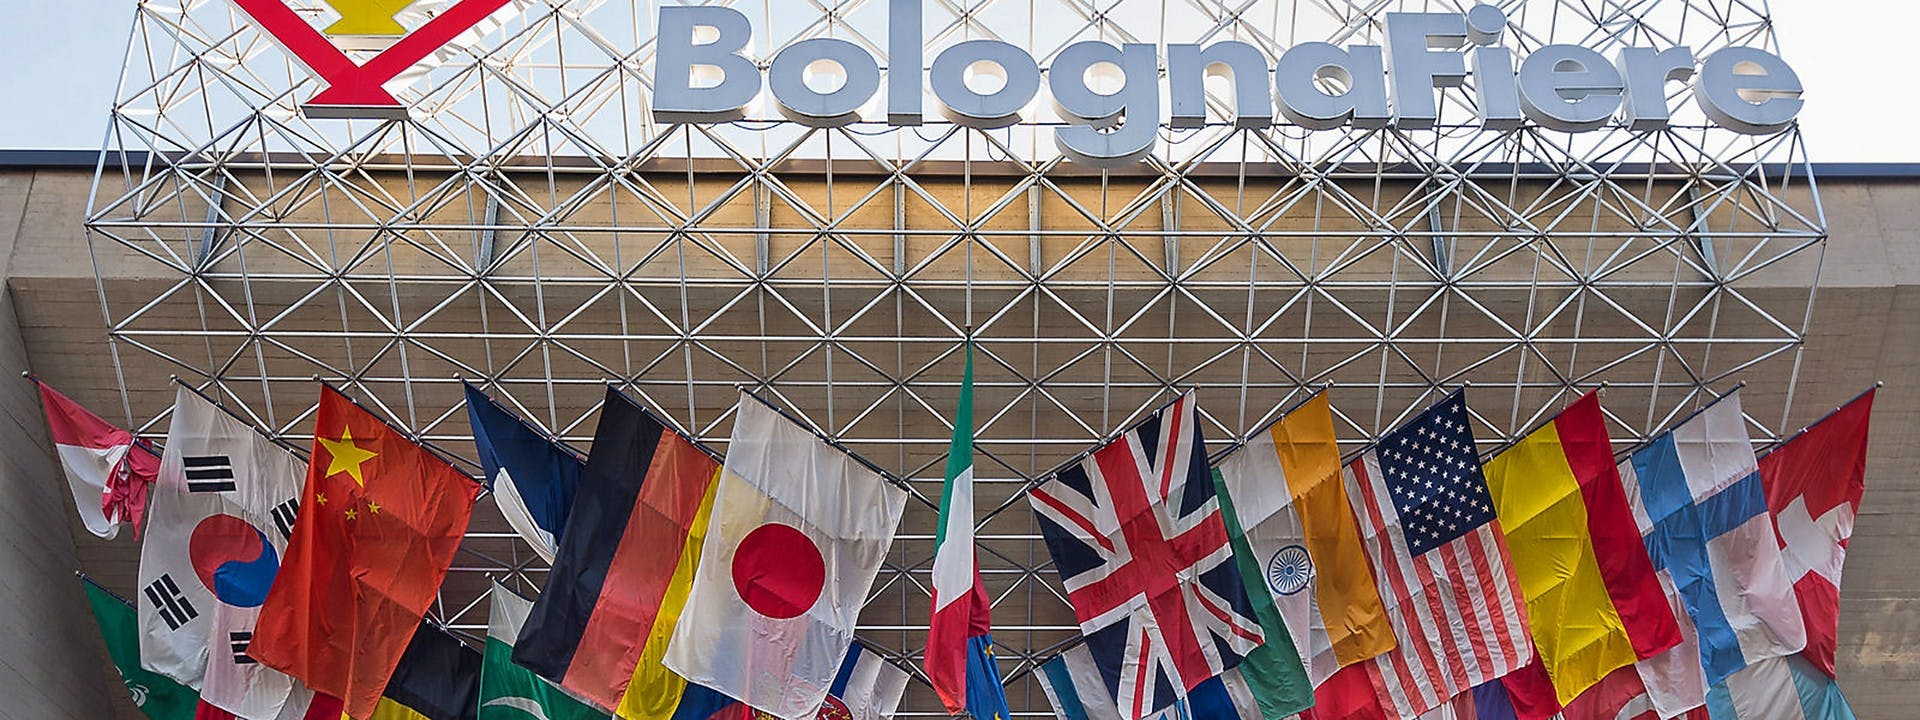 Motor Show Bologna Fiere